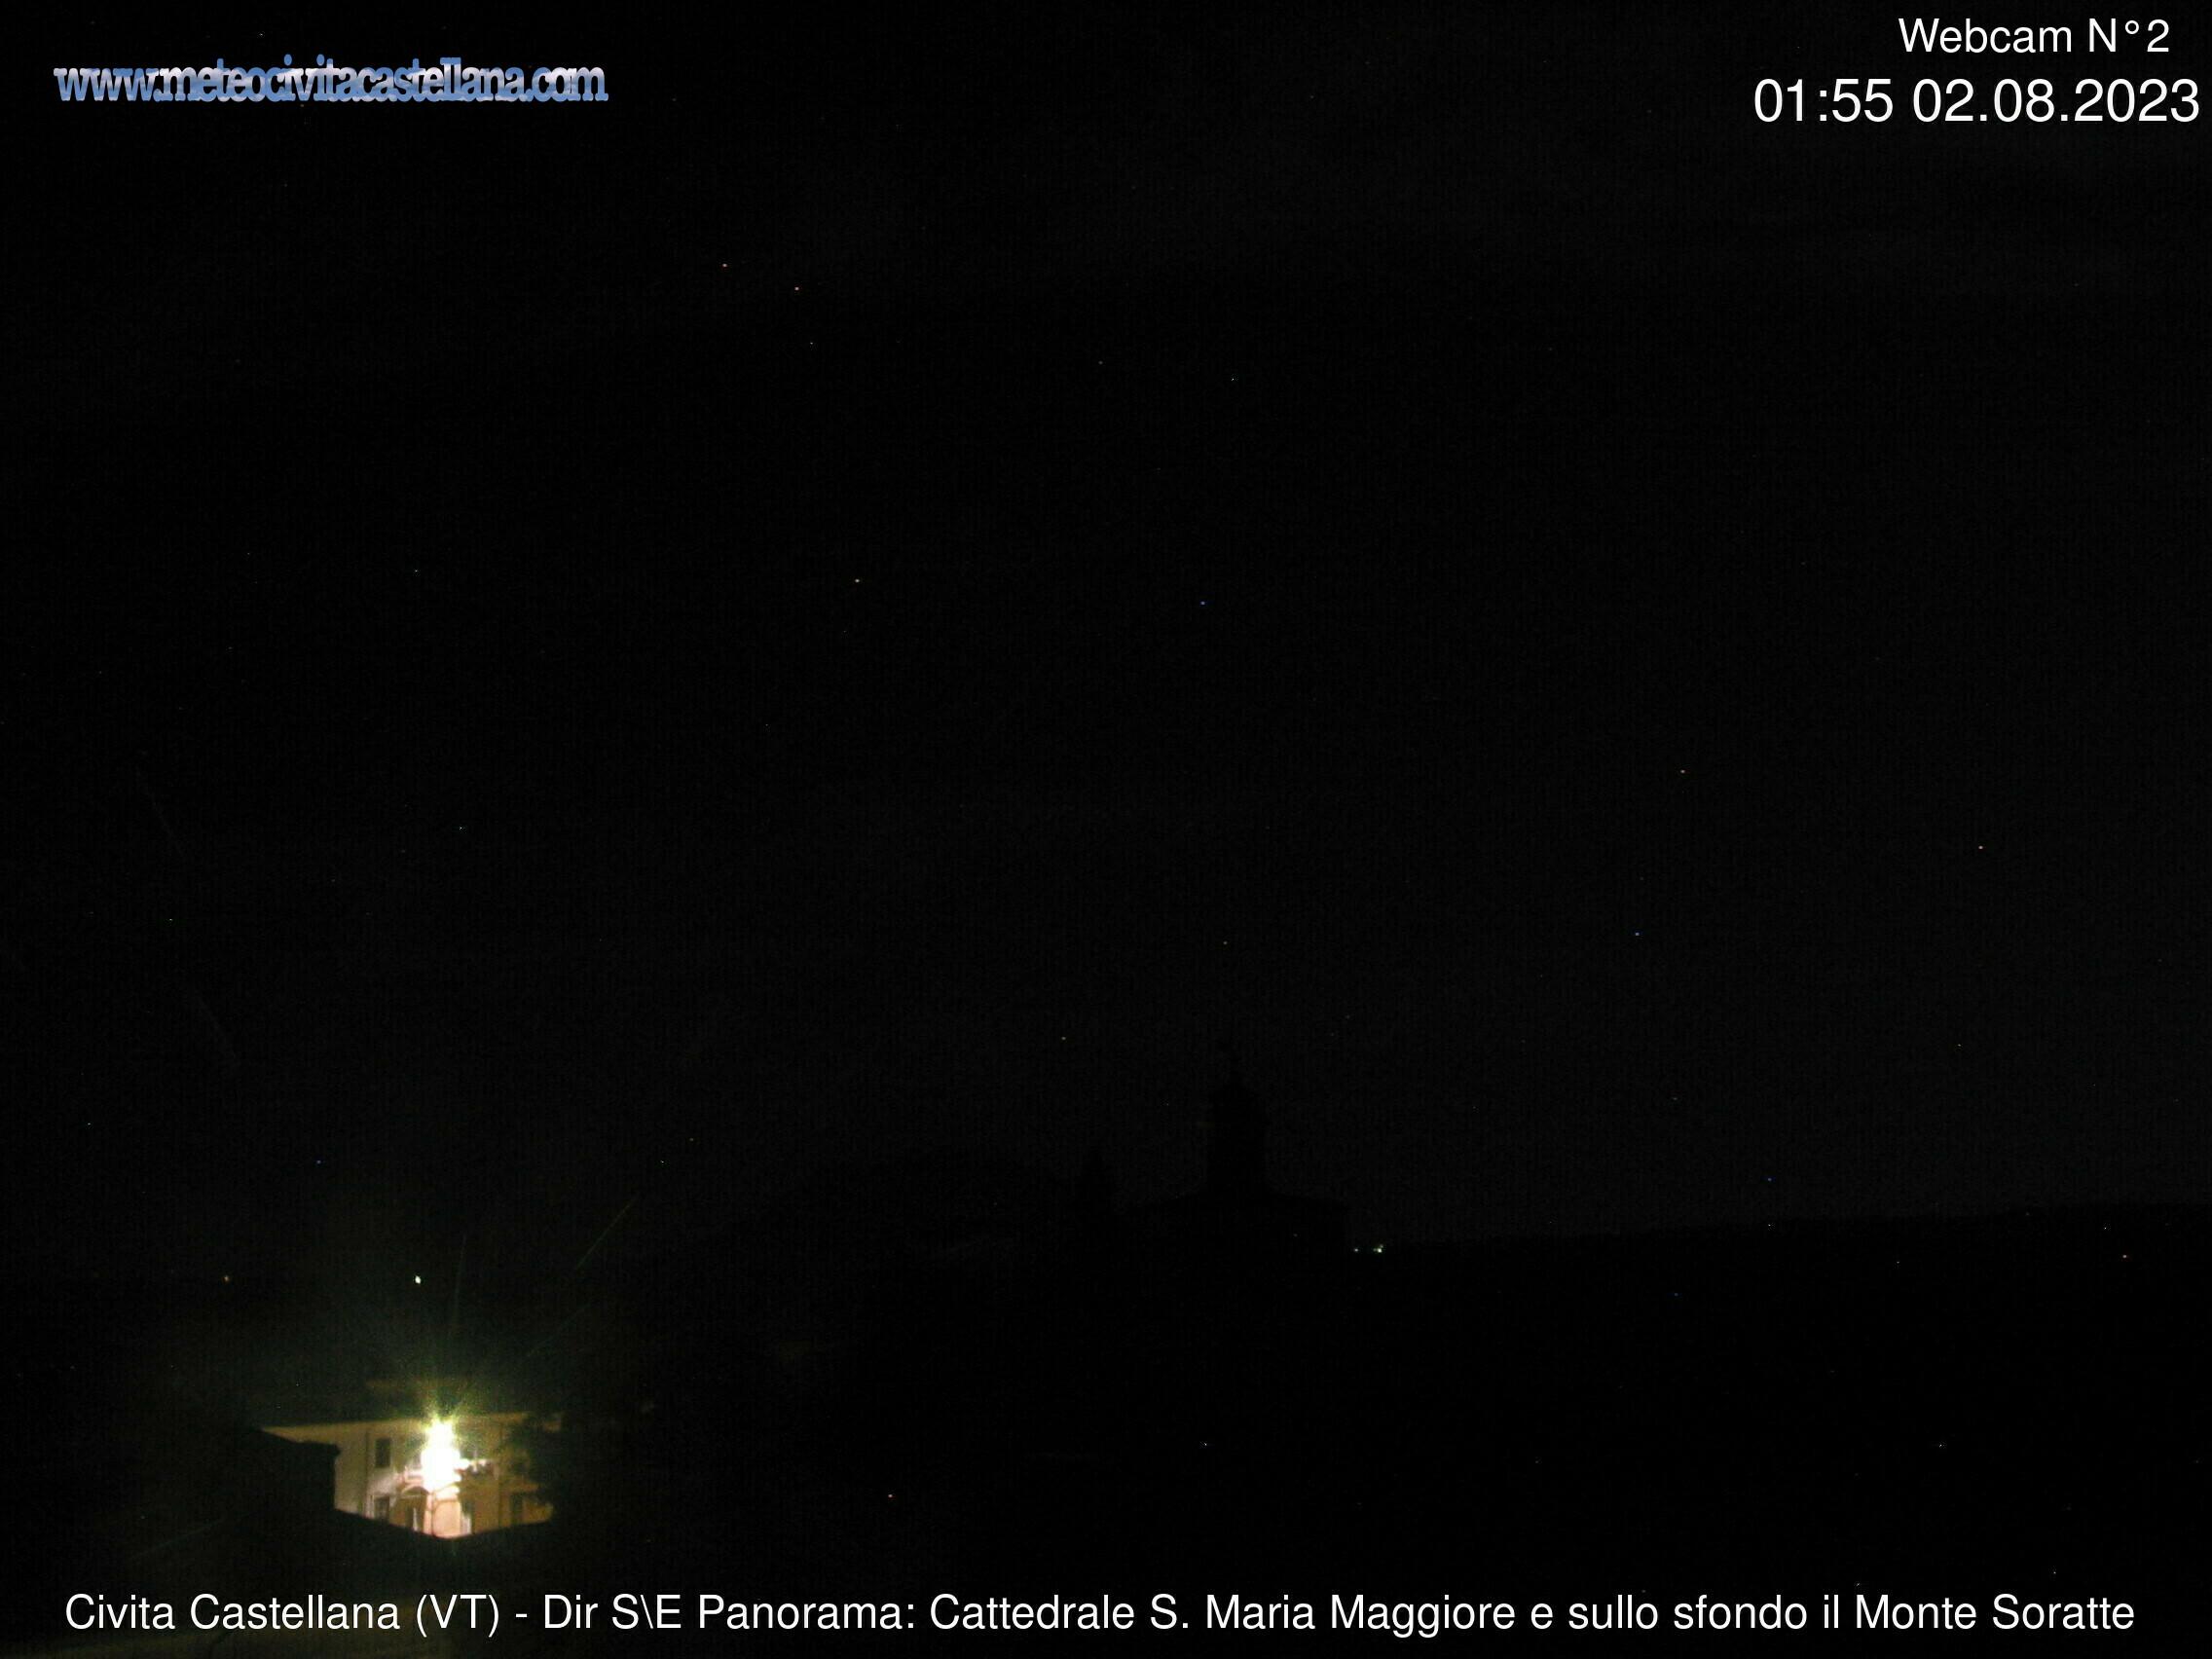 Civita Castellana Sat. 01:58